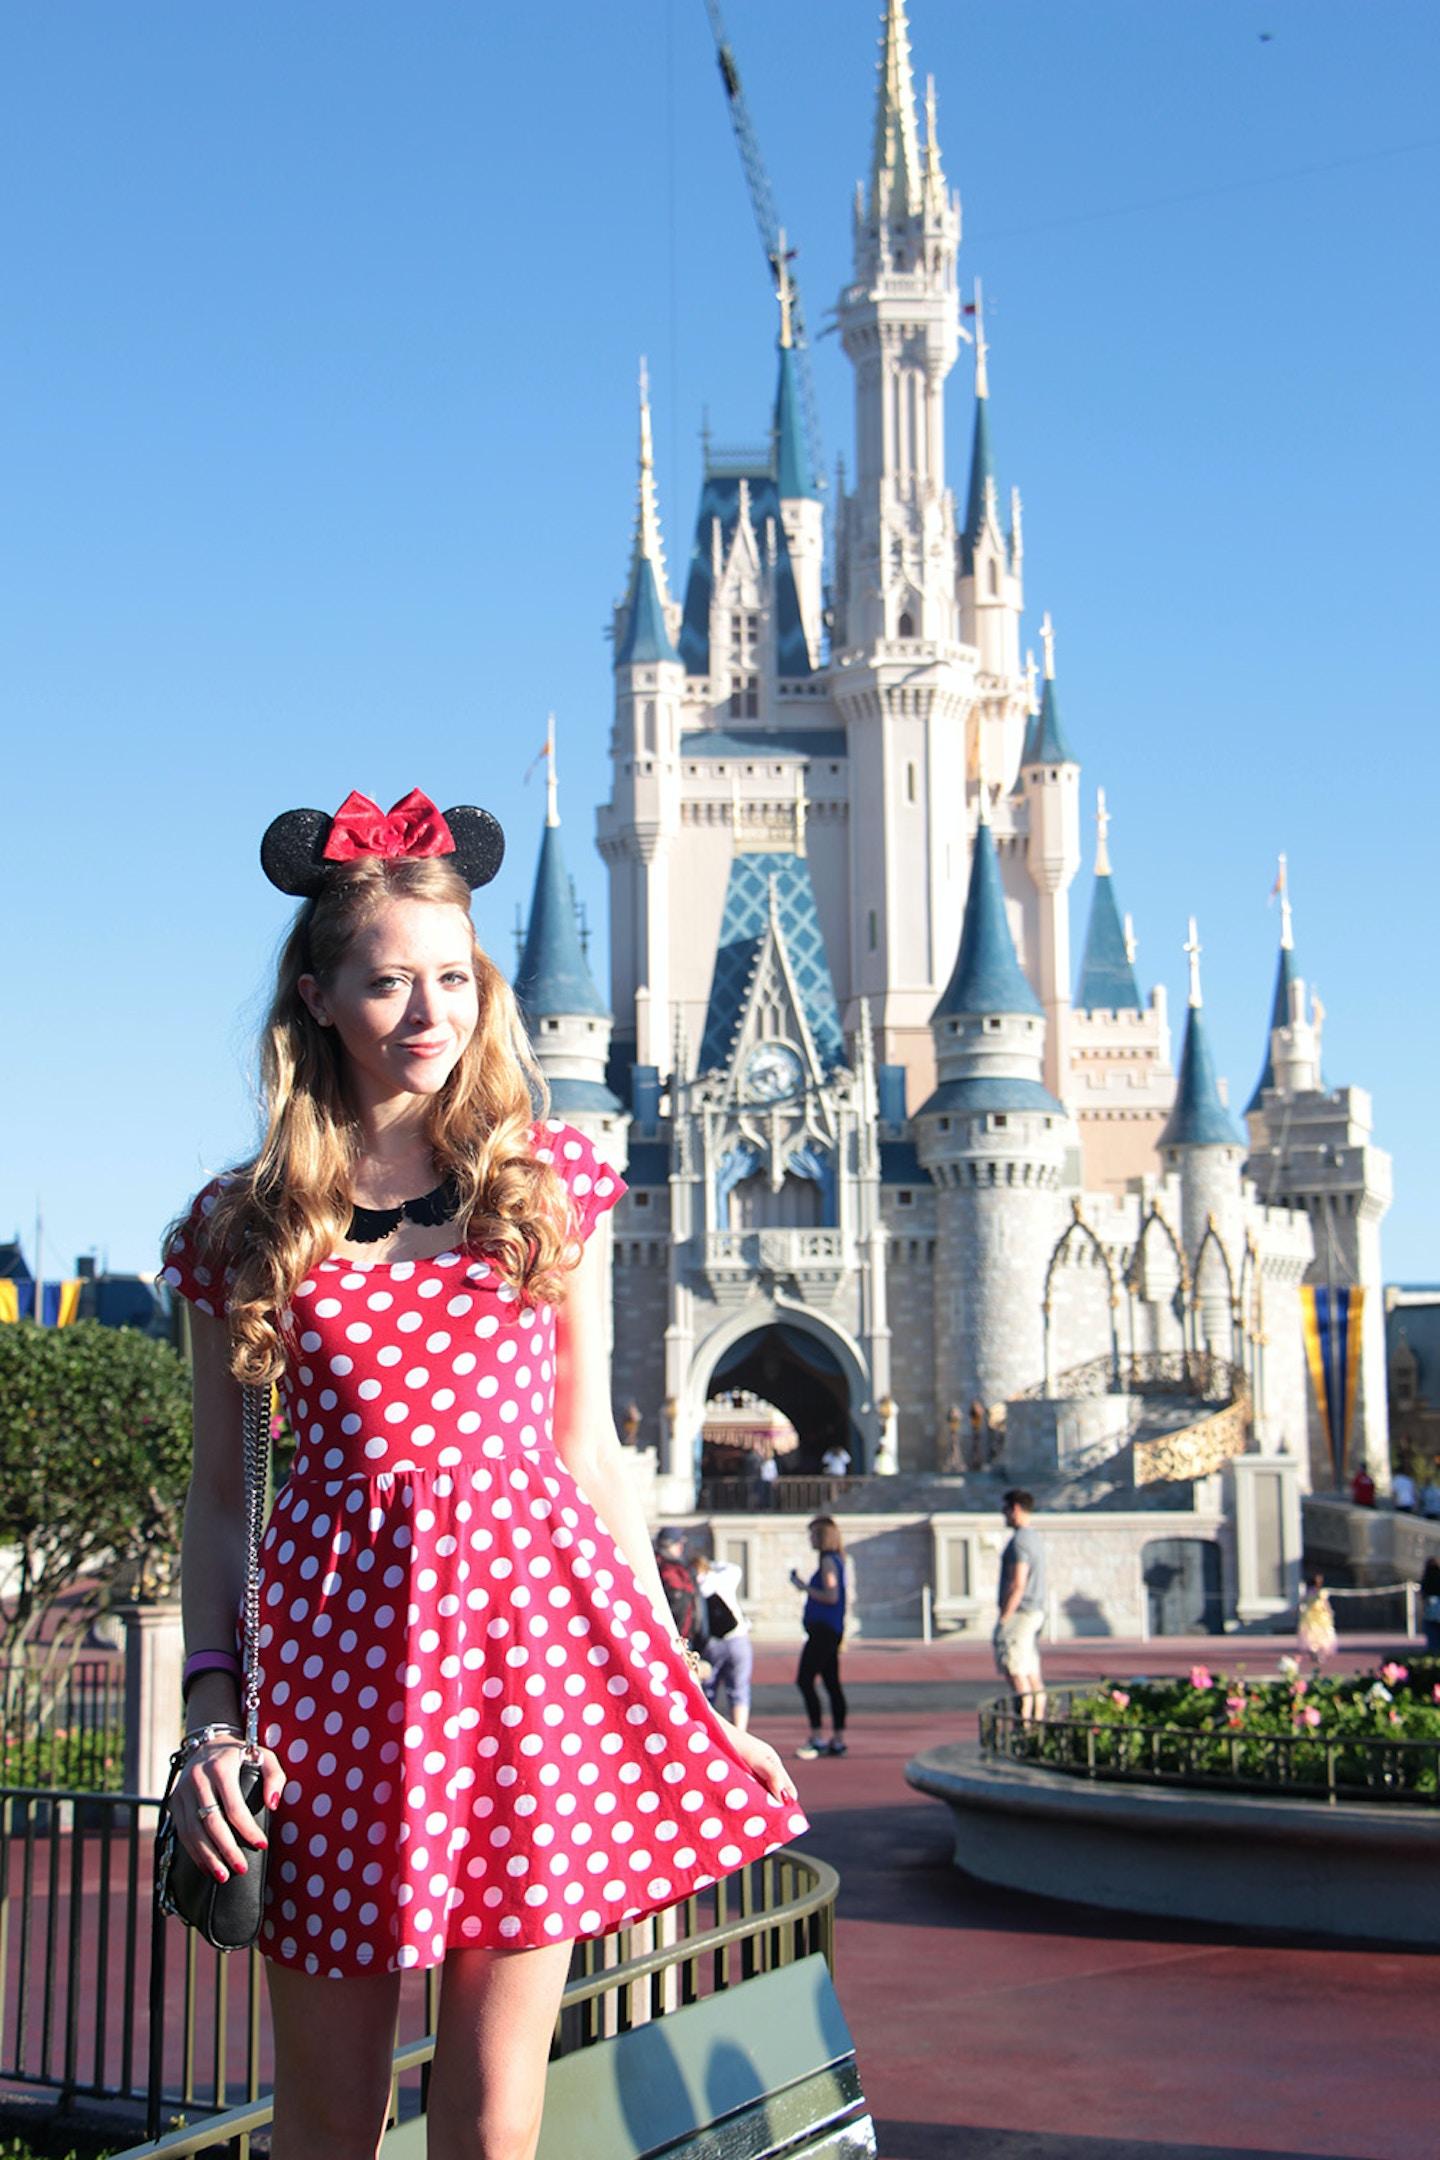 Minnie Mouse visits Magic Kingdom